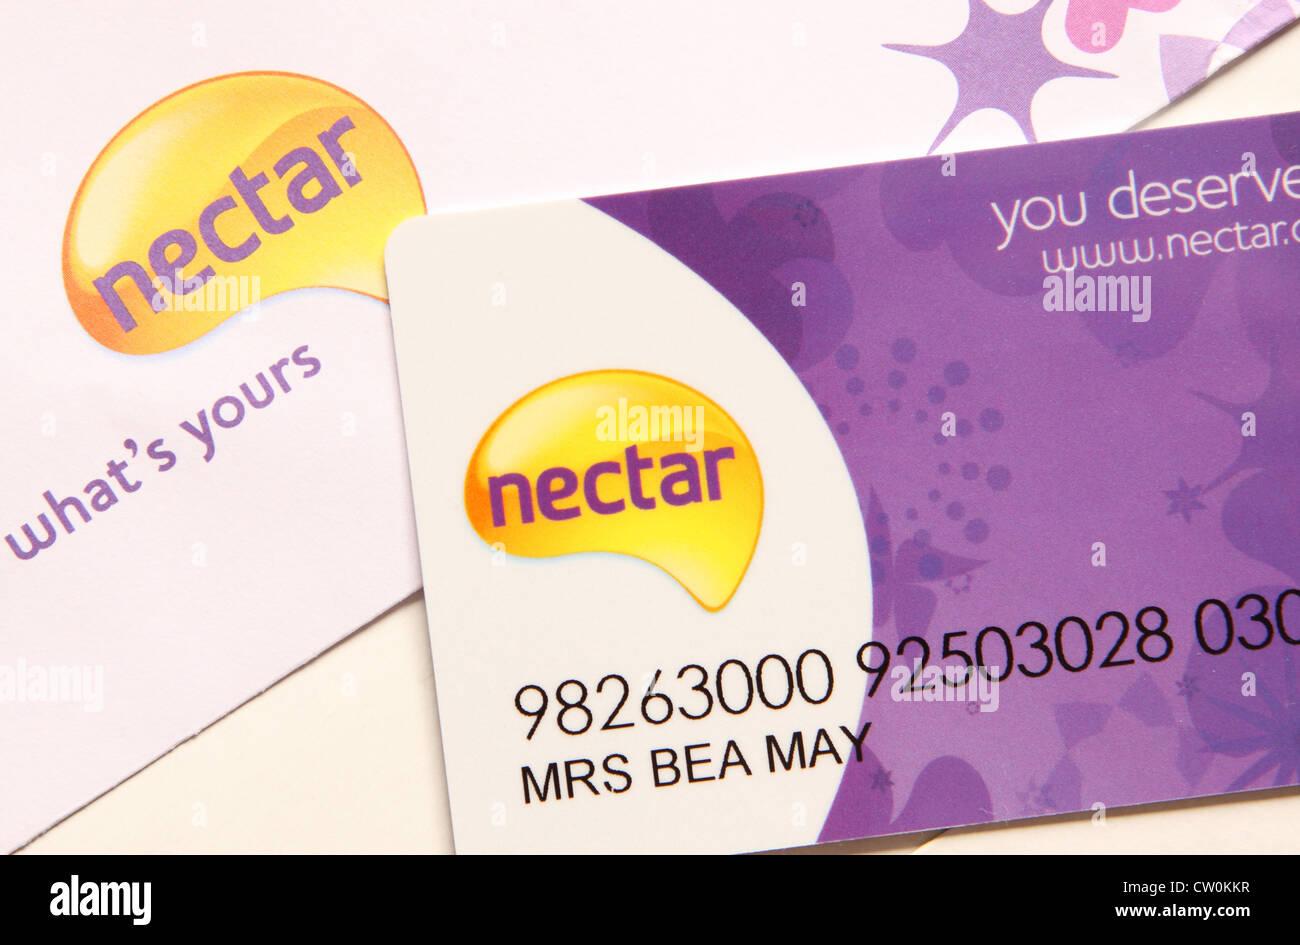 Nectar reward points card - Stock Image